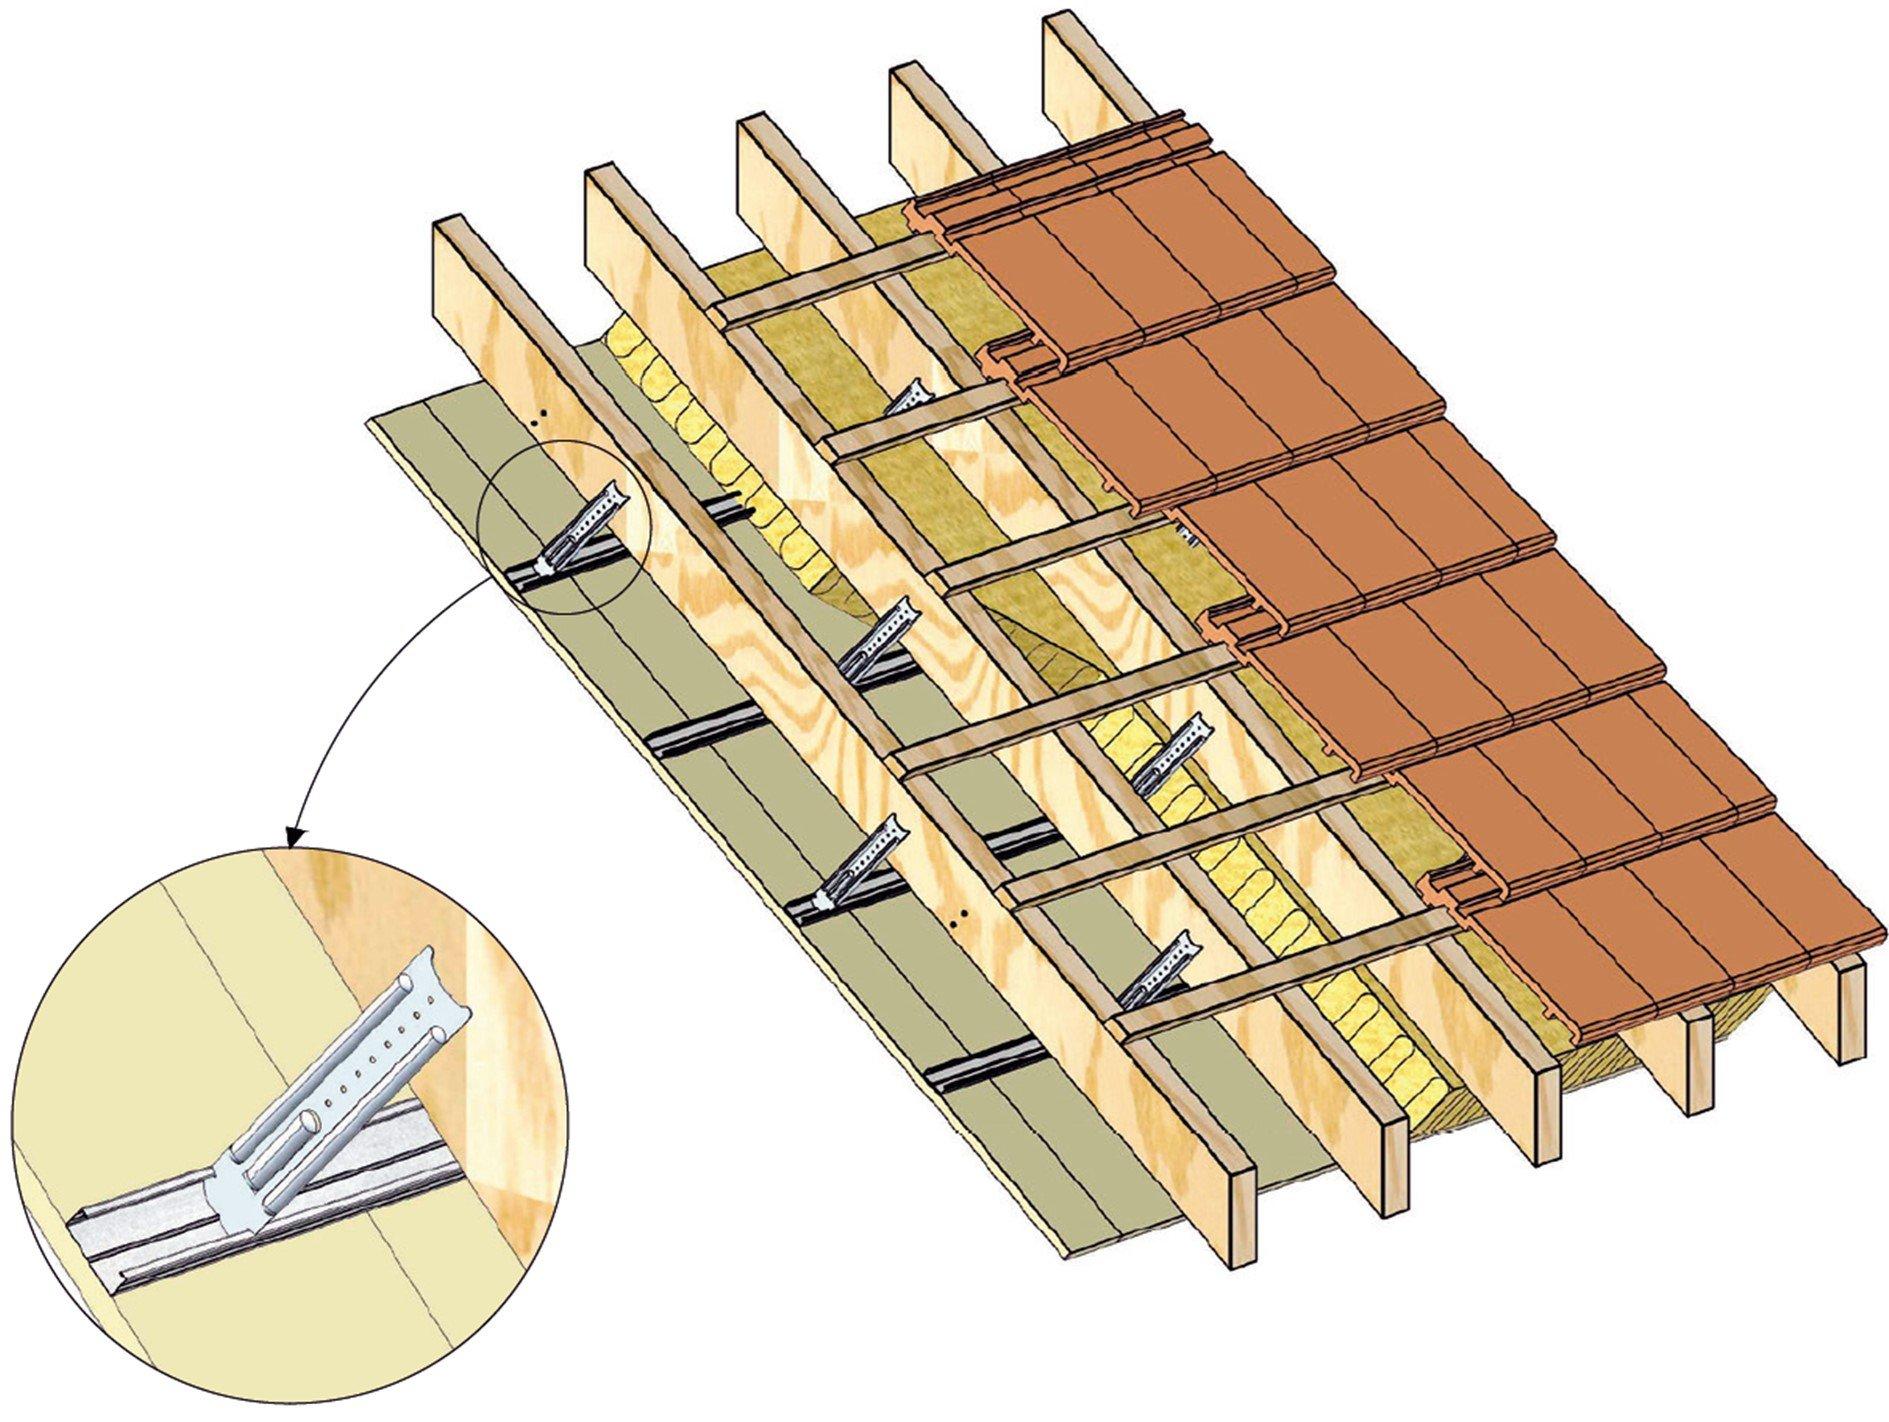 Plafond knauf m tal 2 ks13 plafonds pl tre knauf m tal for Suspente knauf